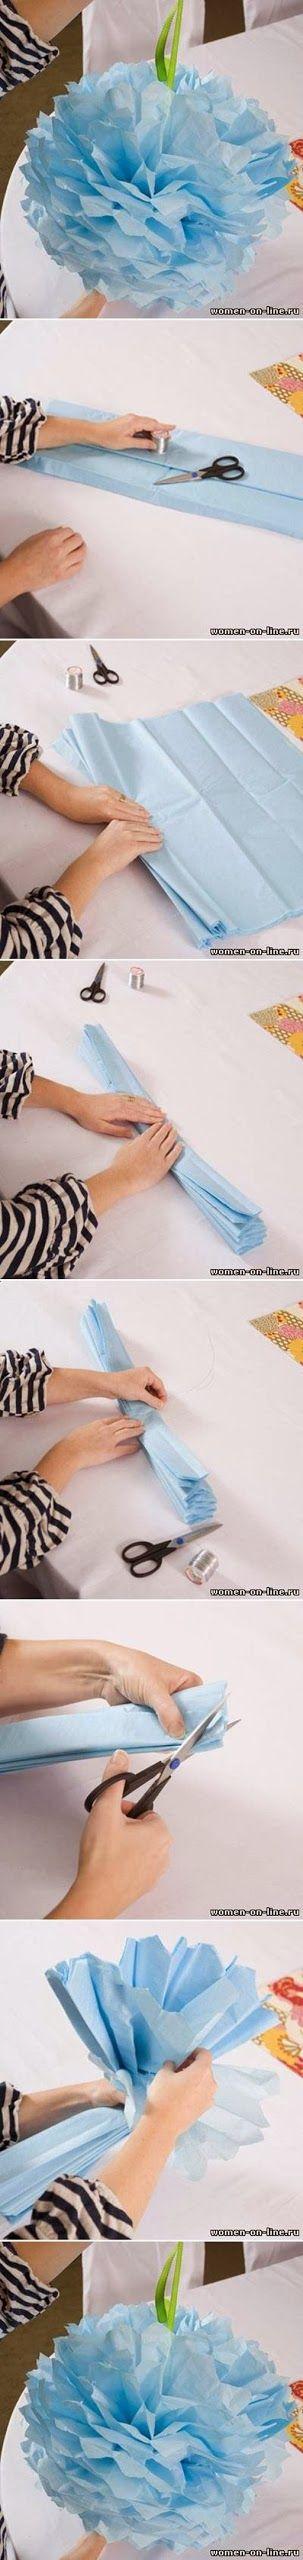 DIY : Nice Simple Paper Flower | DIY & Crafts Tutorials